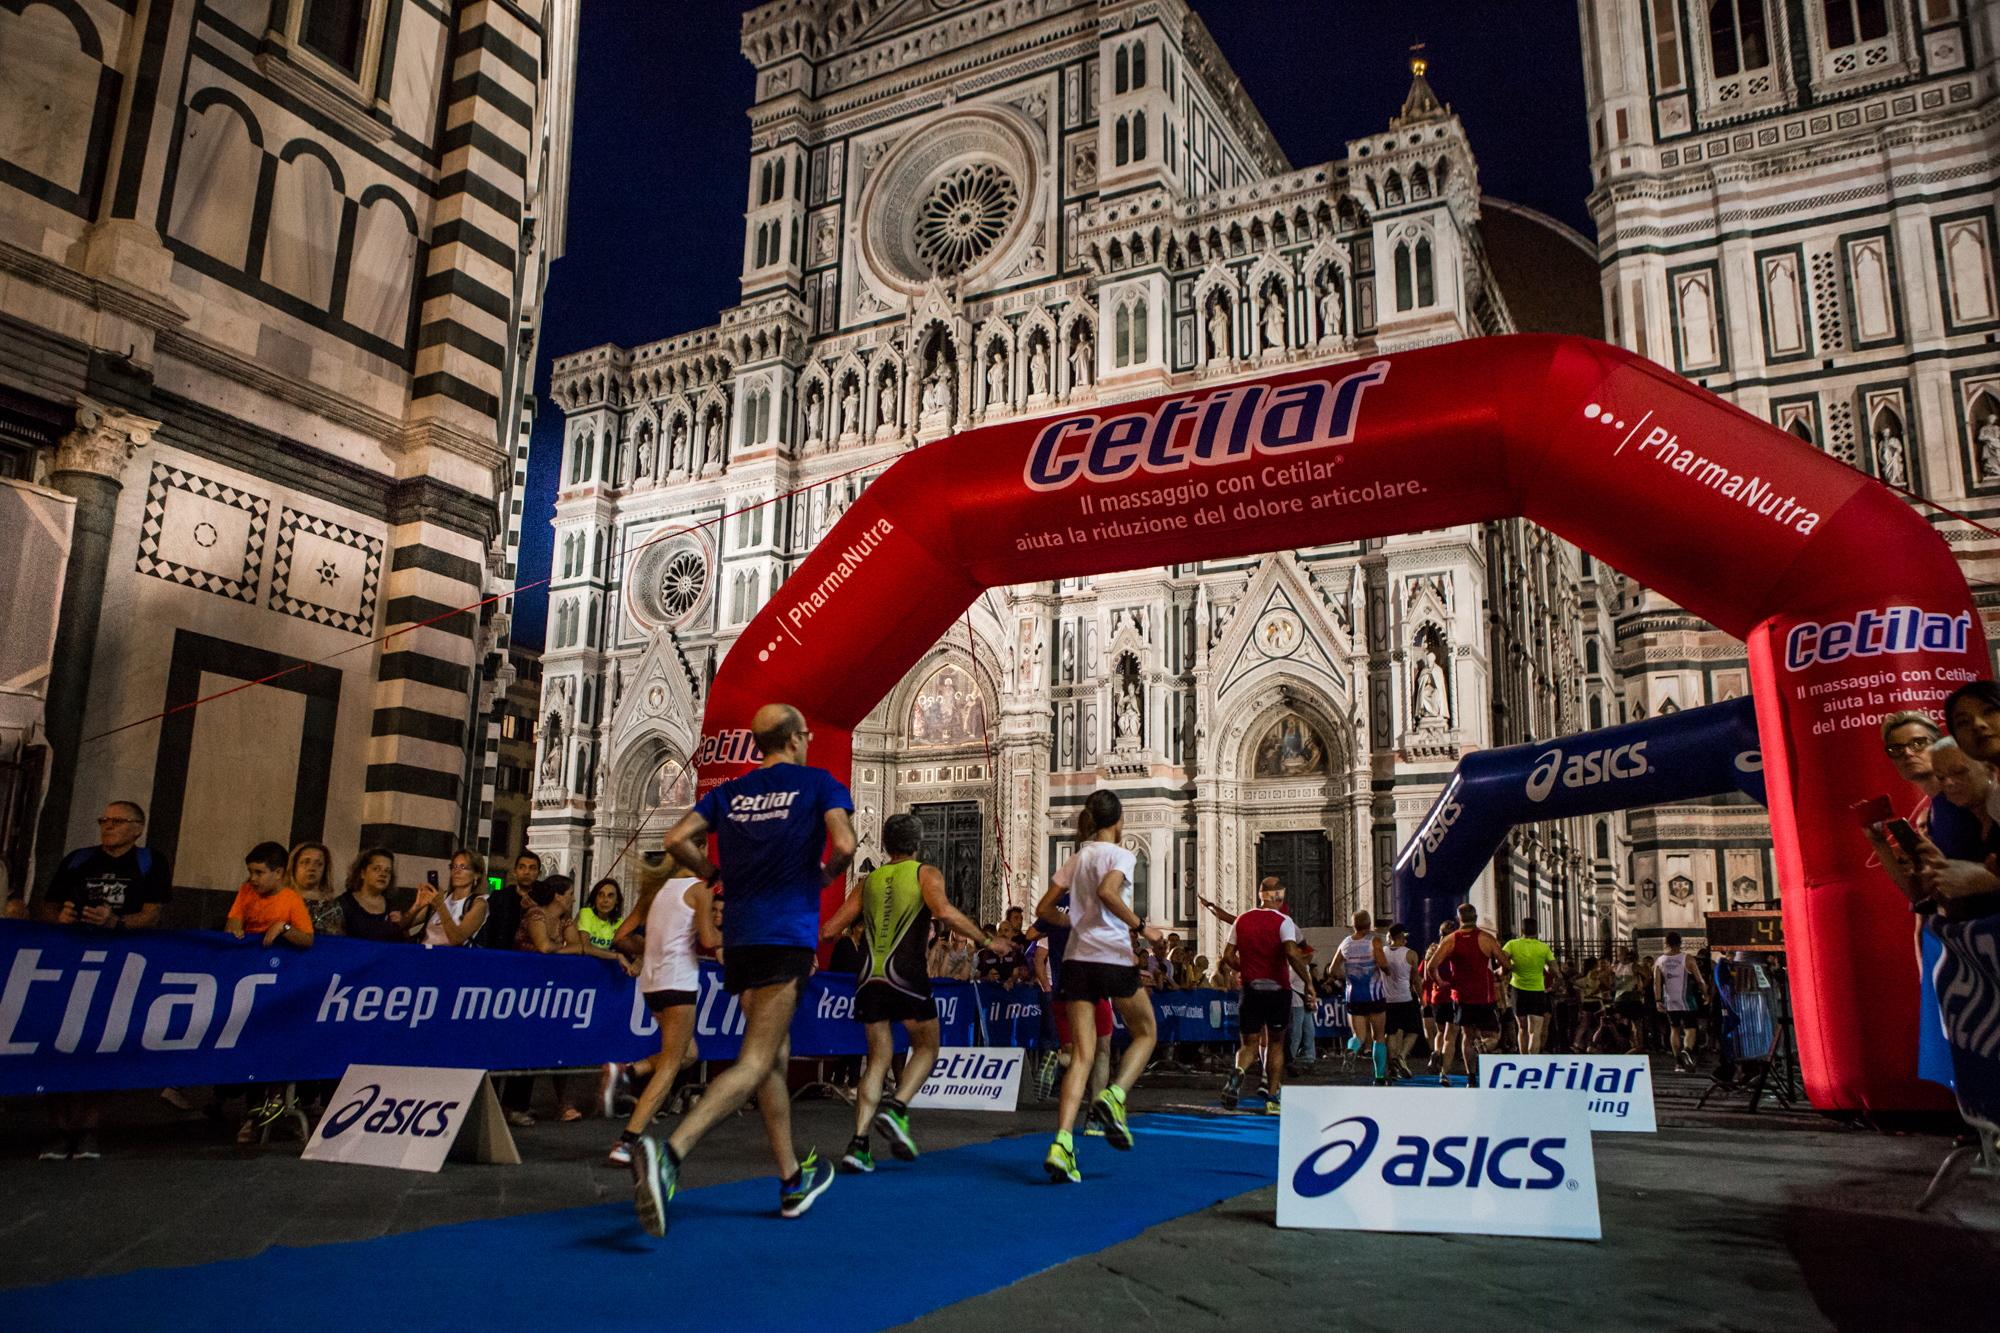 arrivo runner alla cetilar run notturna di san giovanni 2020 in piazza santa maria del fiore a Firenze